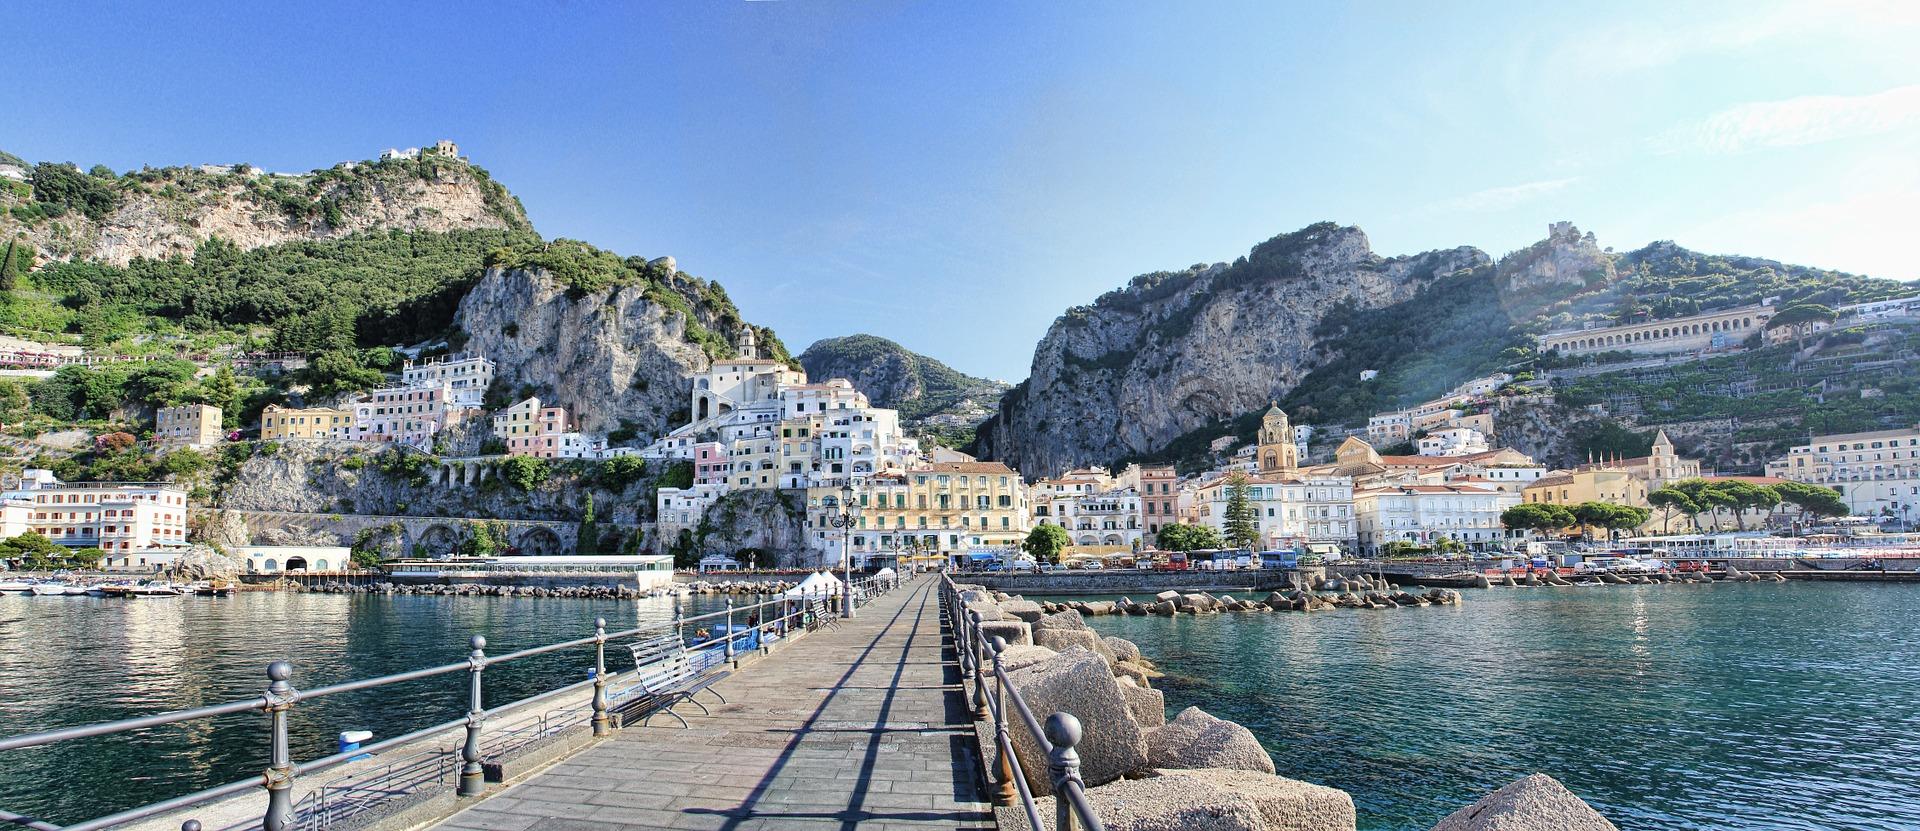 acheloo viaggi, Amalfi and the Coast